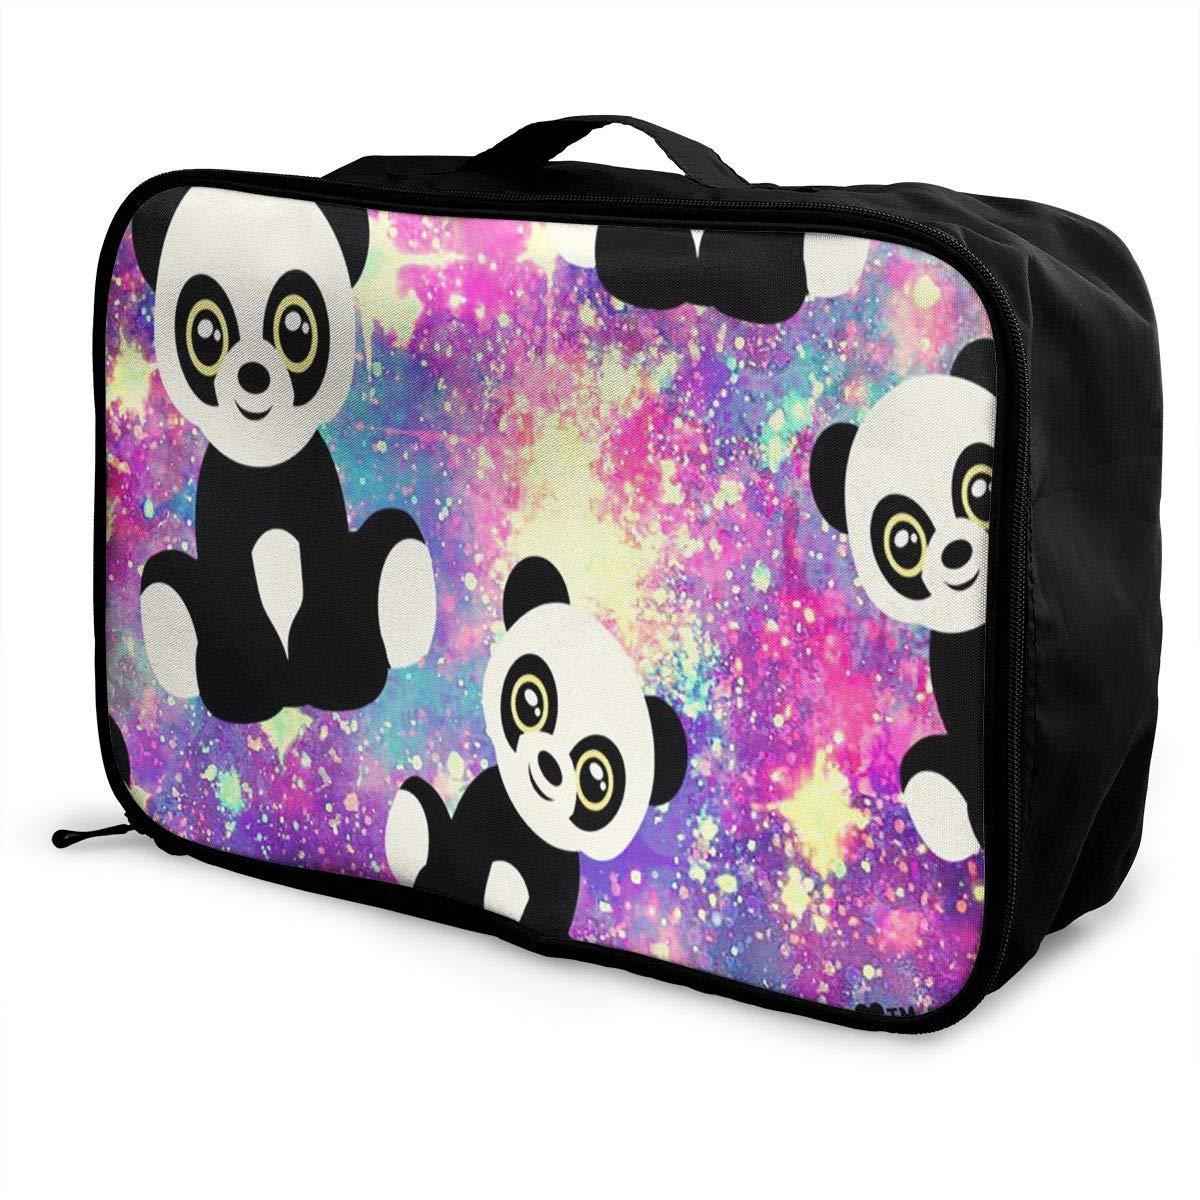 Travel Luggage Duffle Bag Lightweight Portable Handbag Fantasy Panda Print Large Capacity Waterproof Foldable Storage Tote